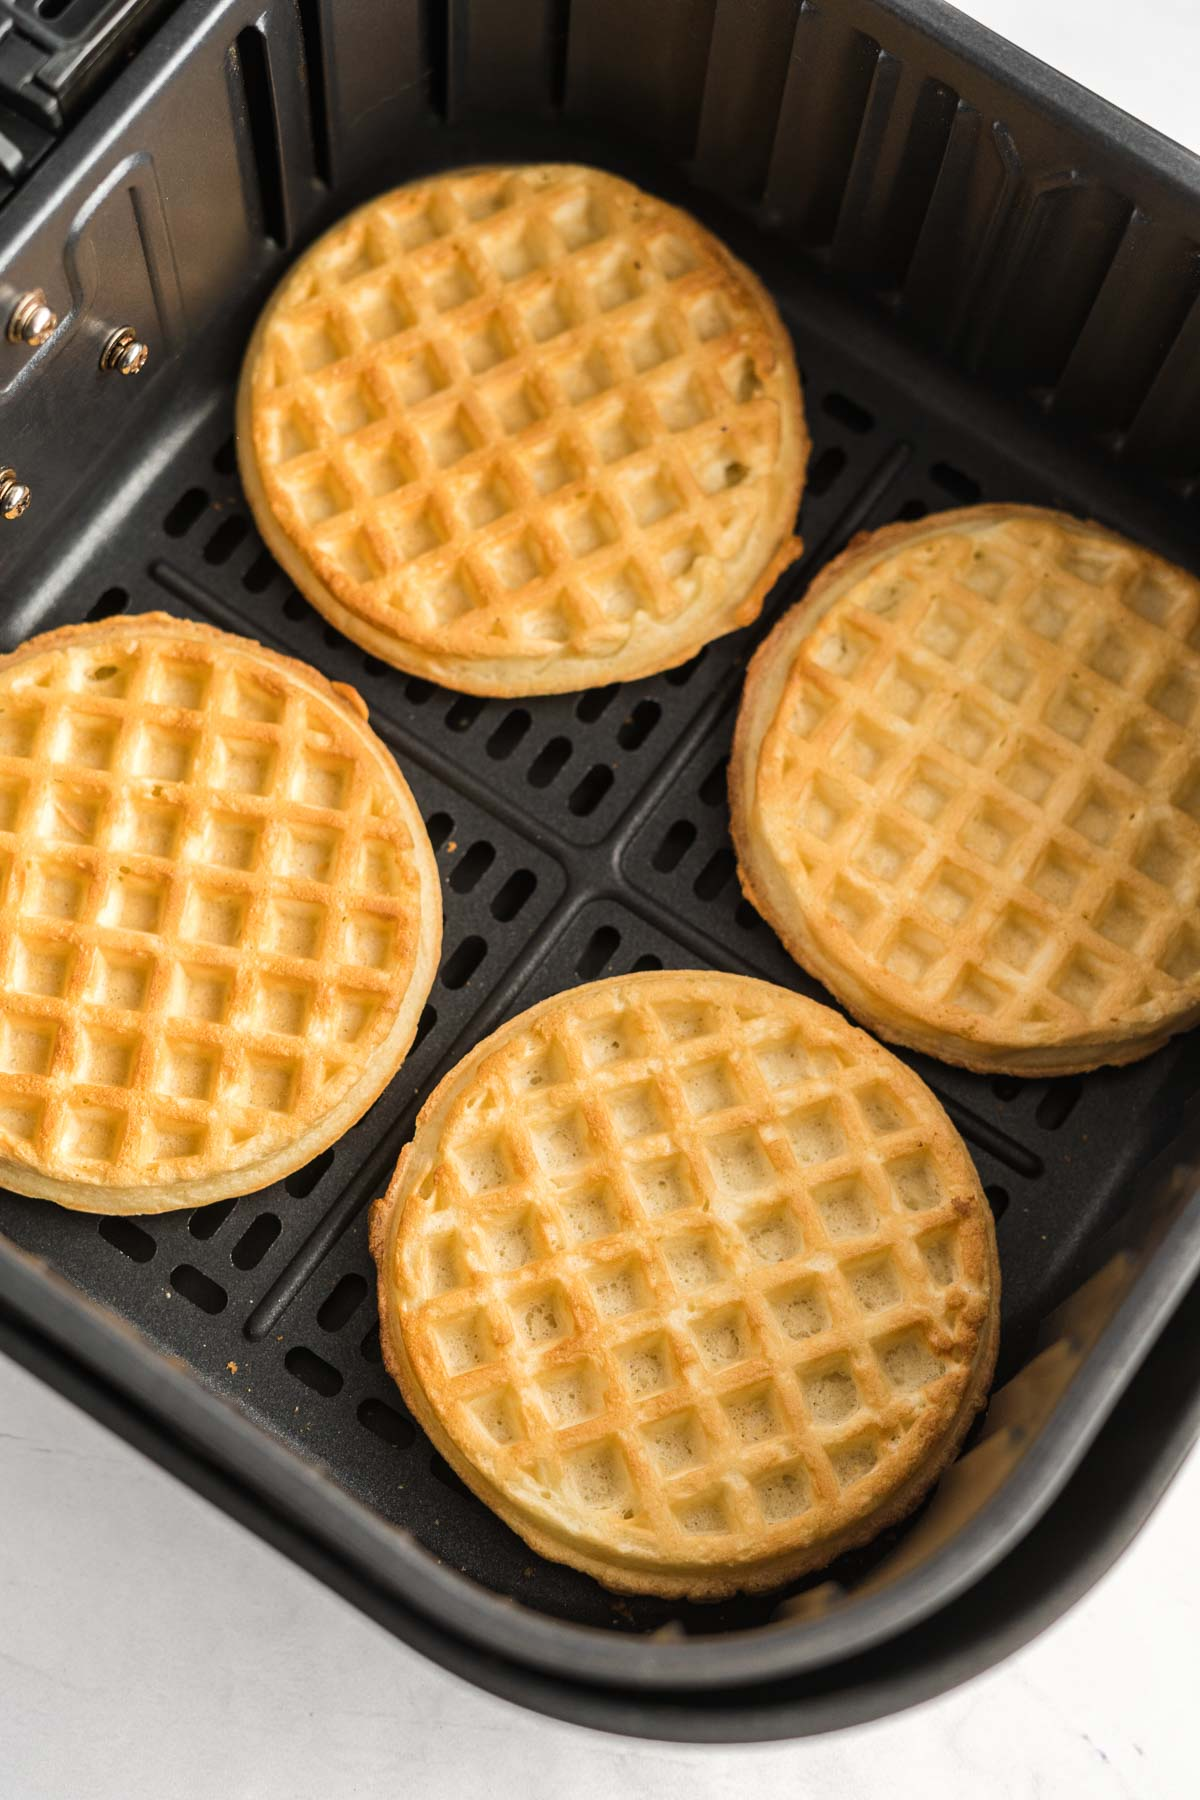 Four frozen waffles in an air fryer basket in a single layer.